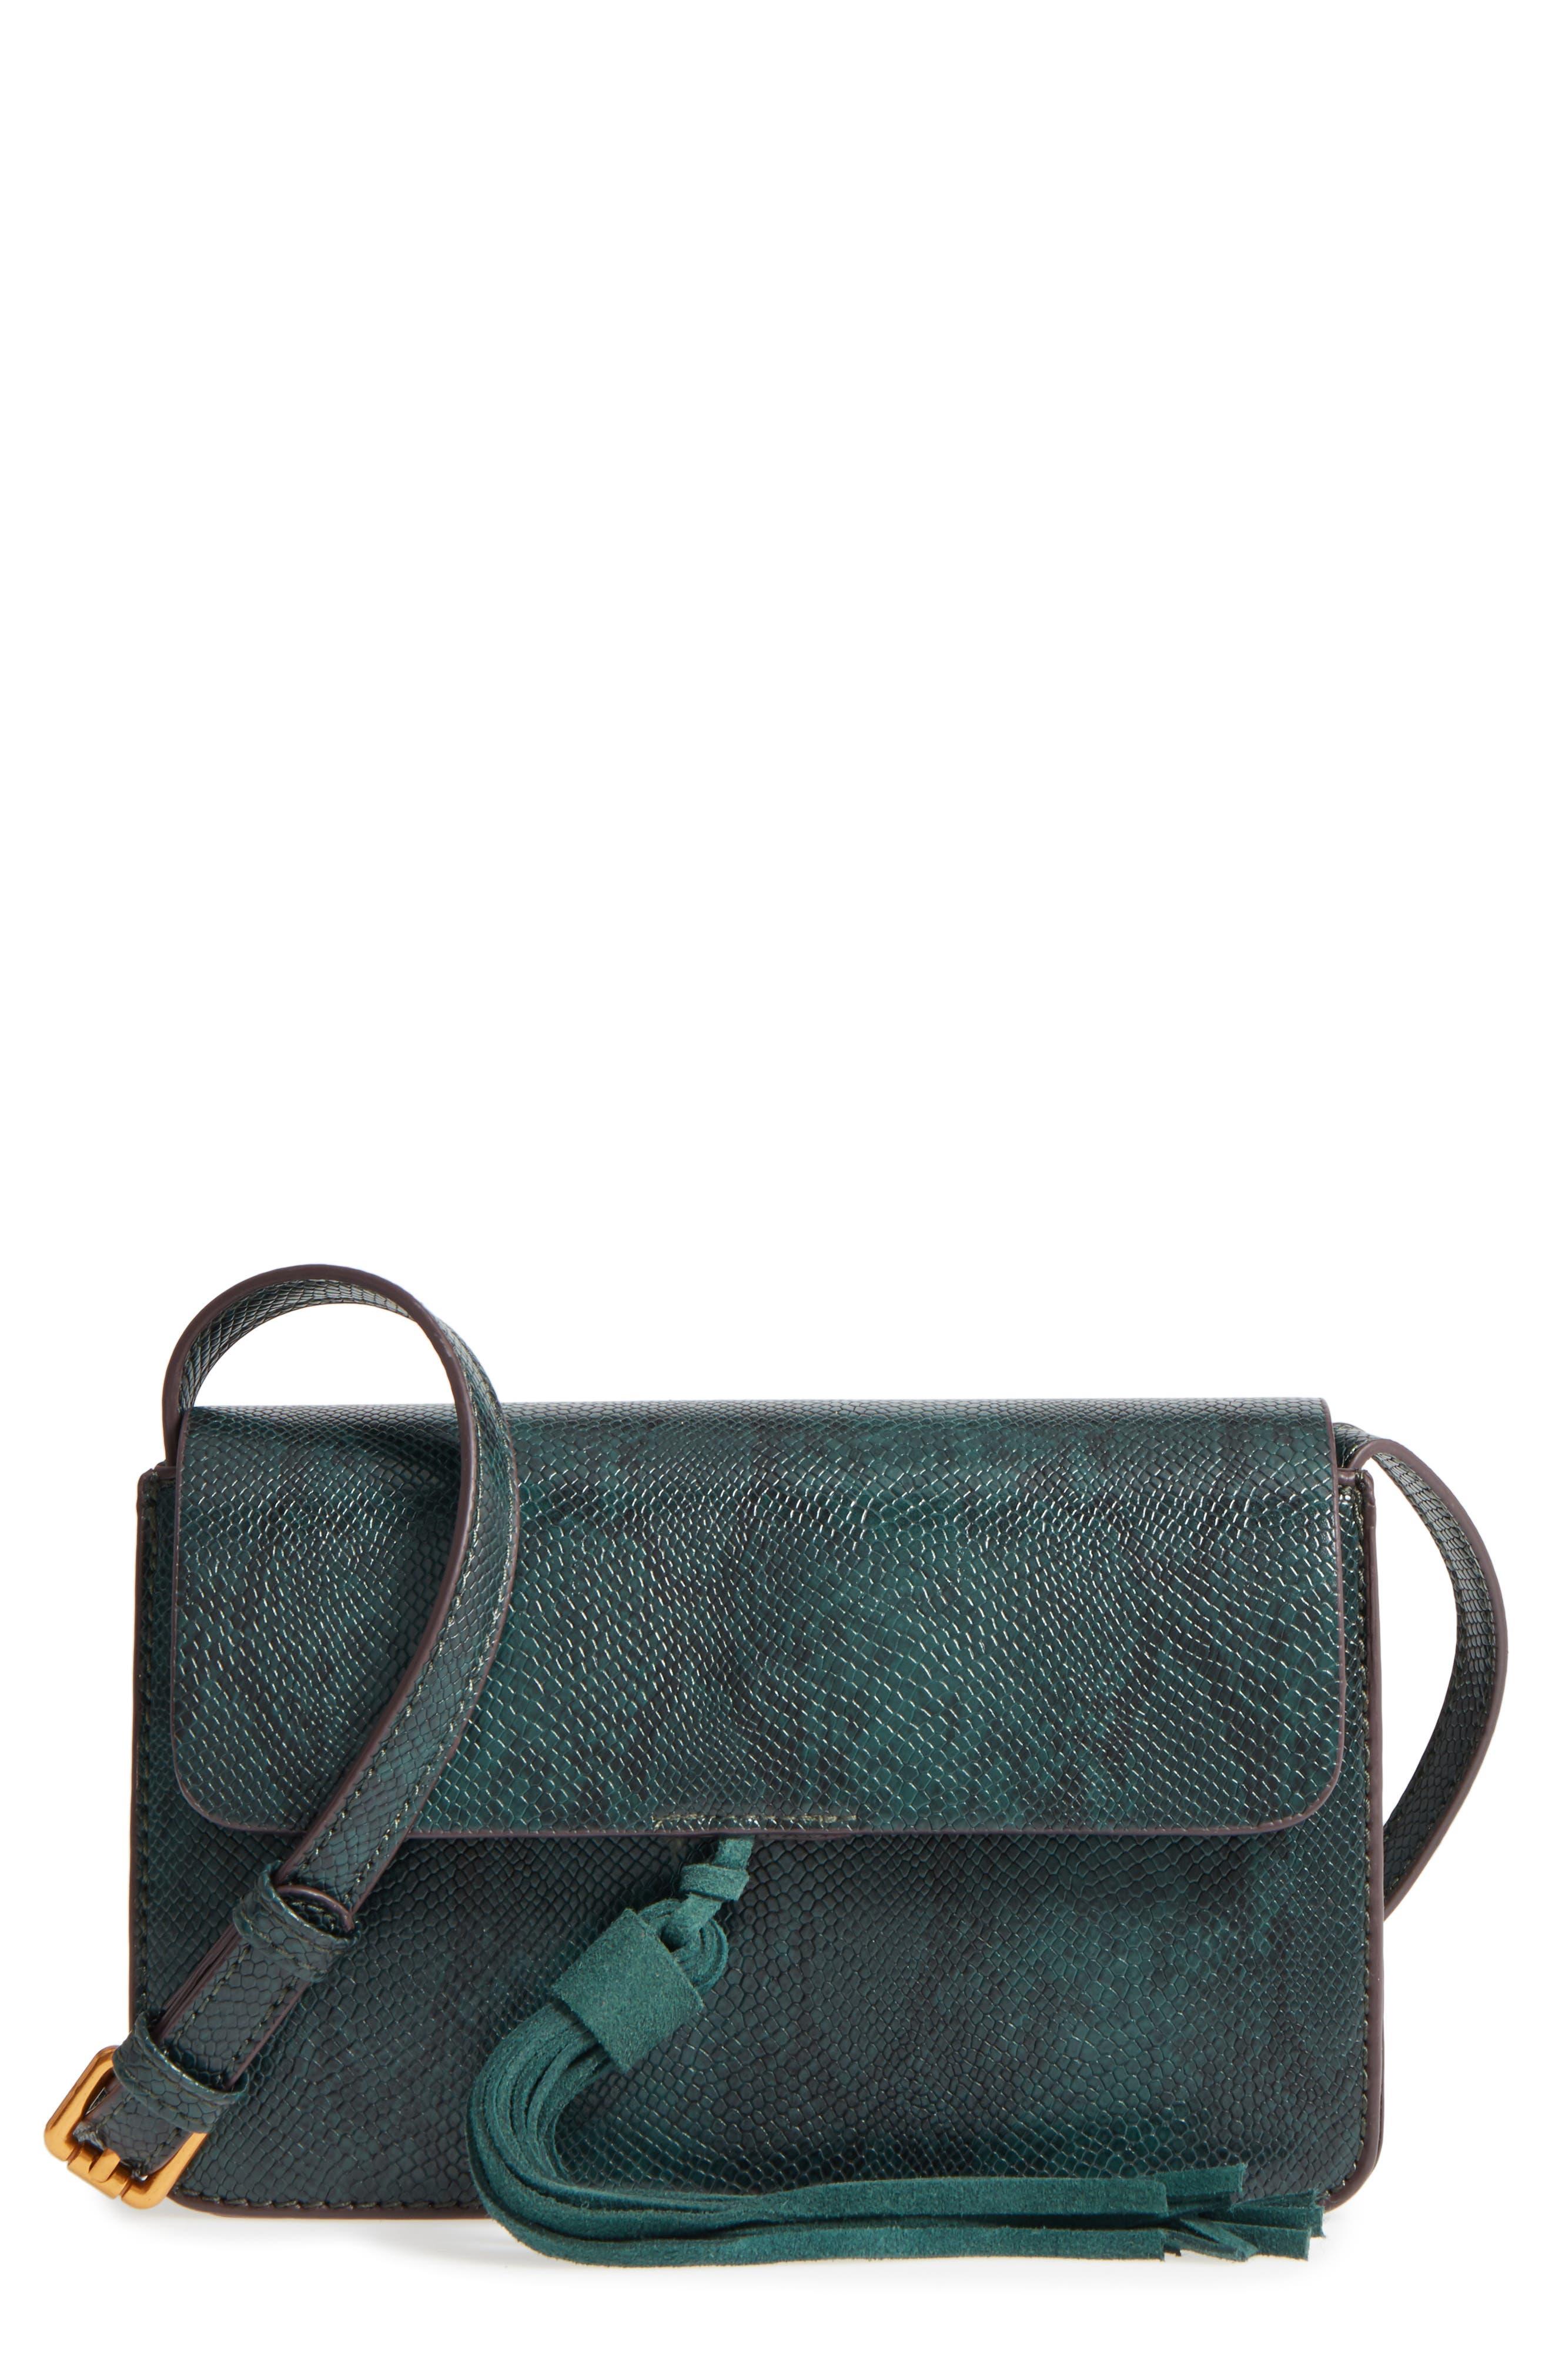 Alternate Image 1 Selected - Street Level Snake Embossed Faux Leather Crossbody Bag